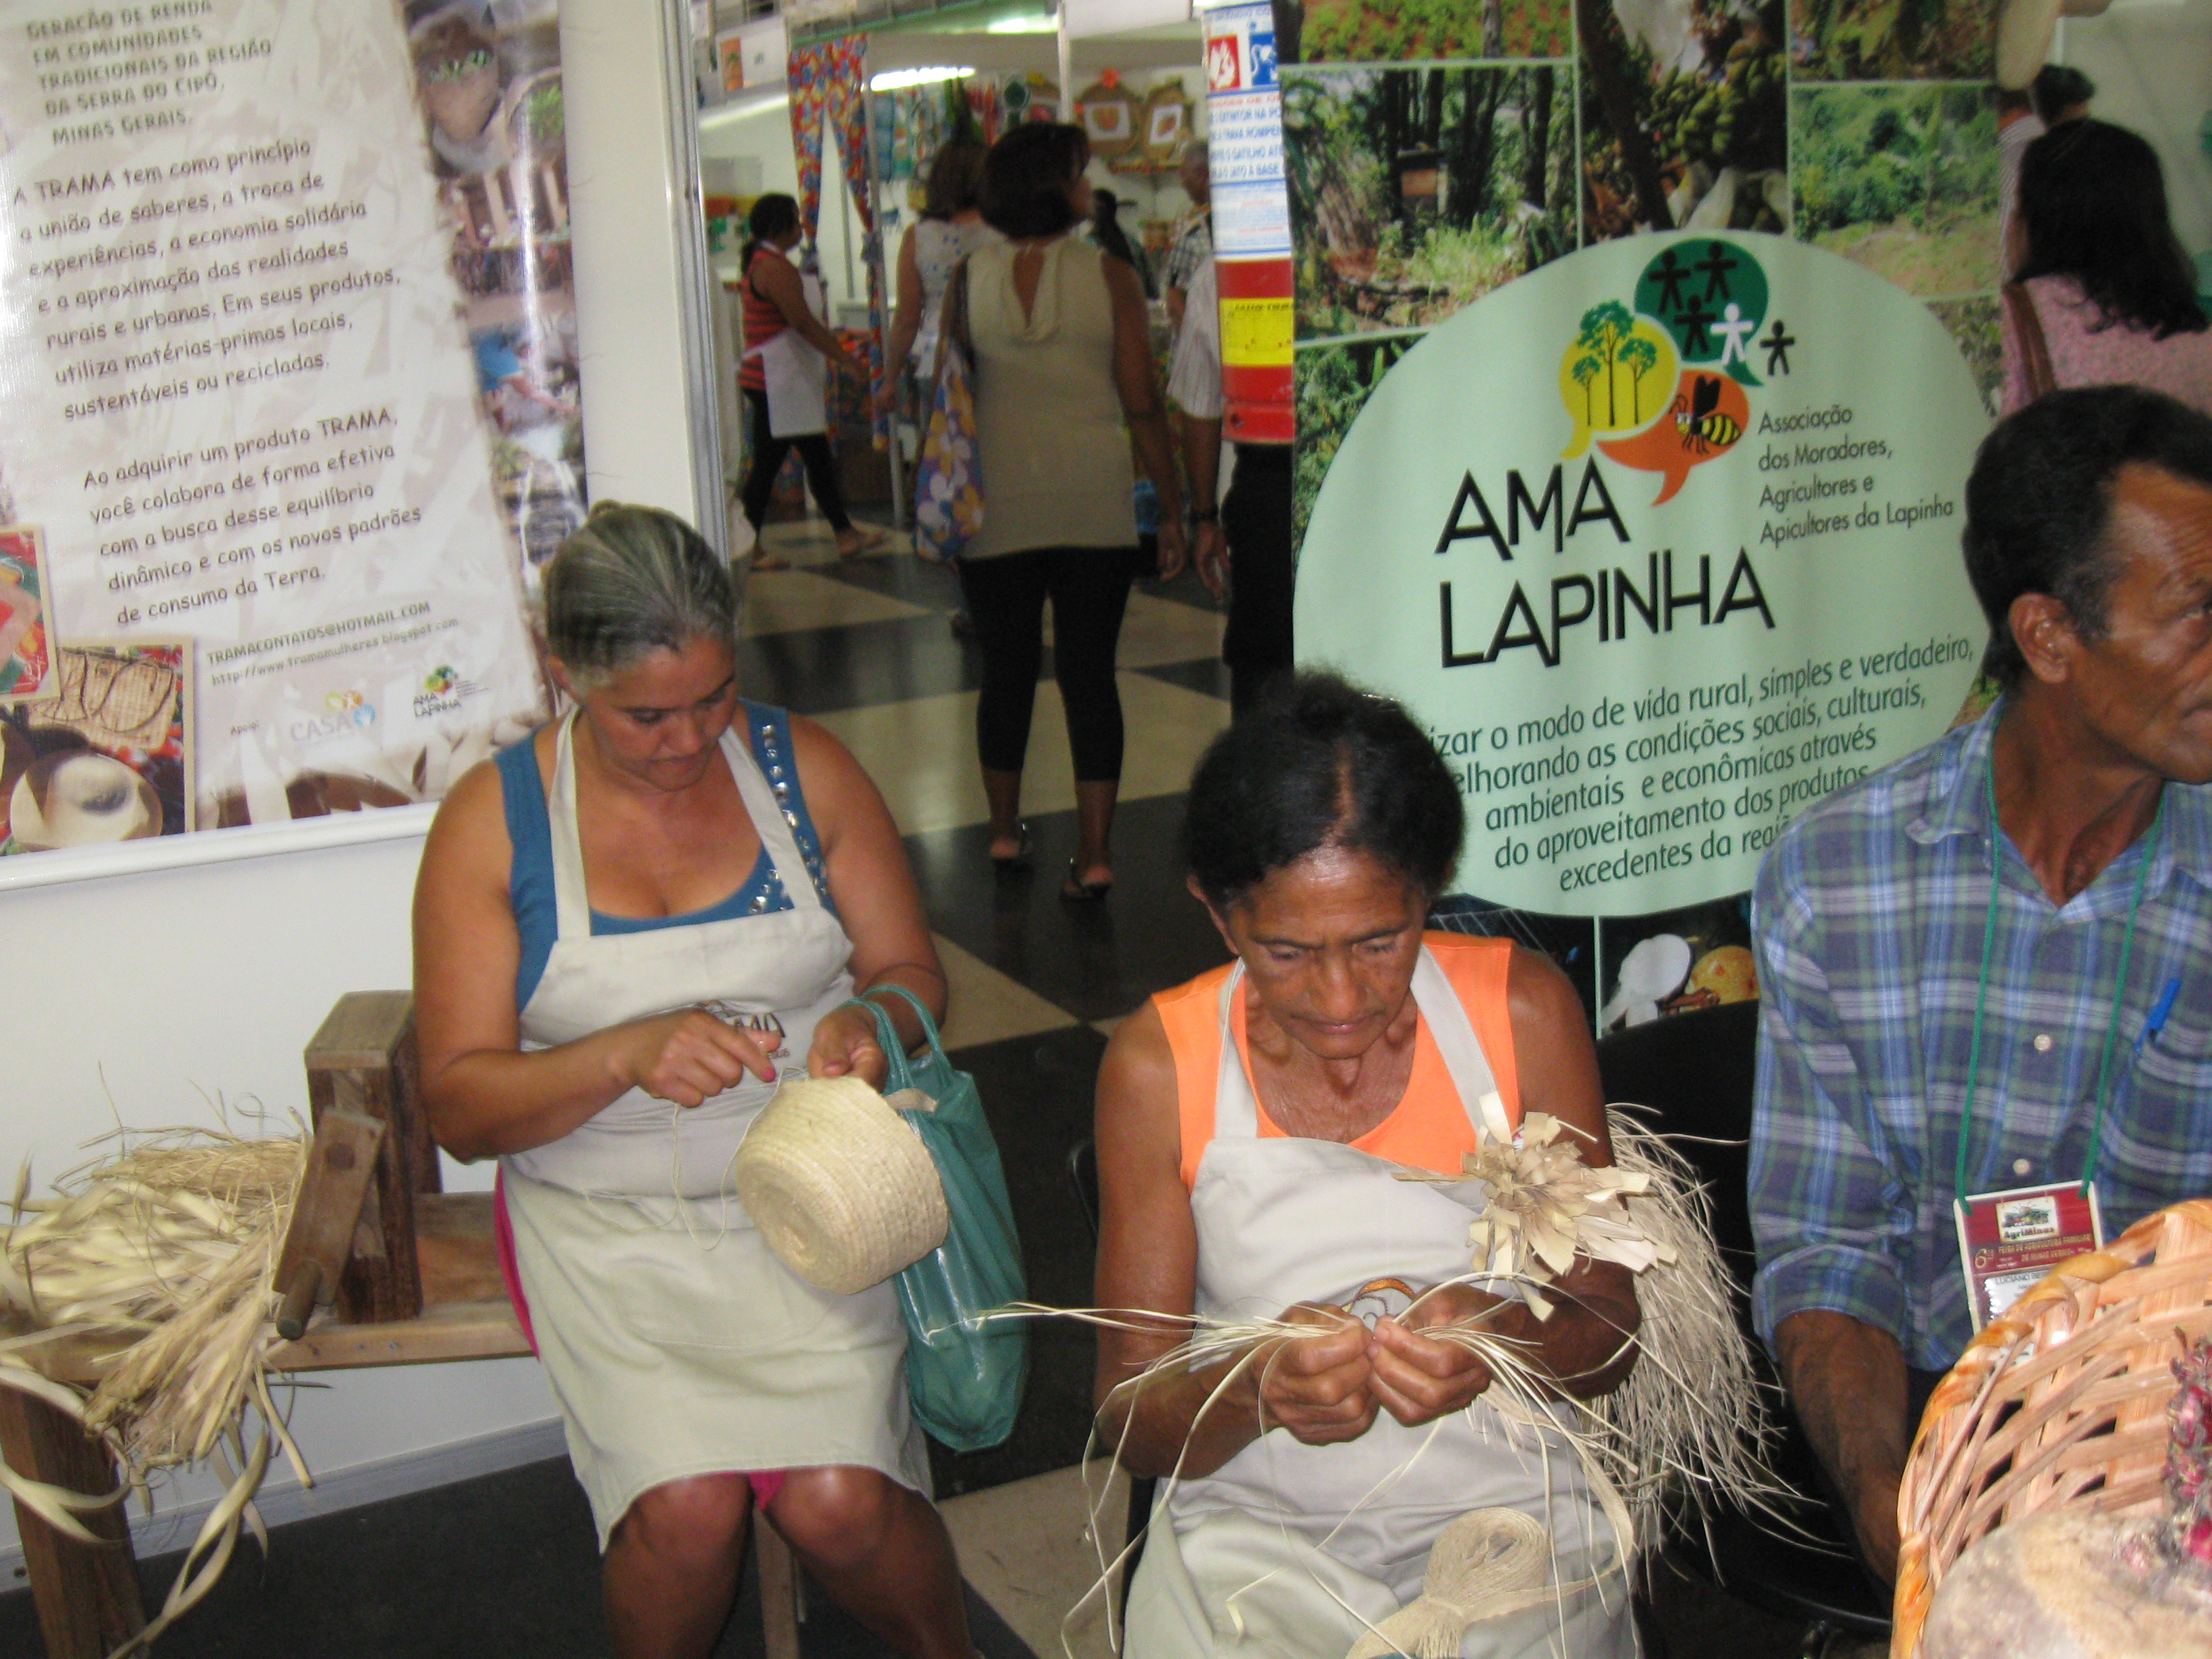 Grupo Trama na AGRIMINAS. Foto: AMA LAPINHA